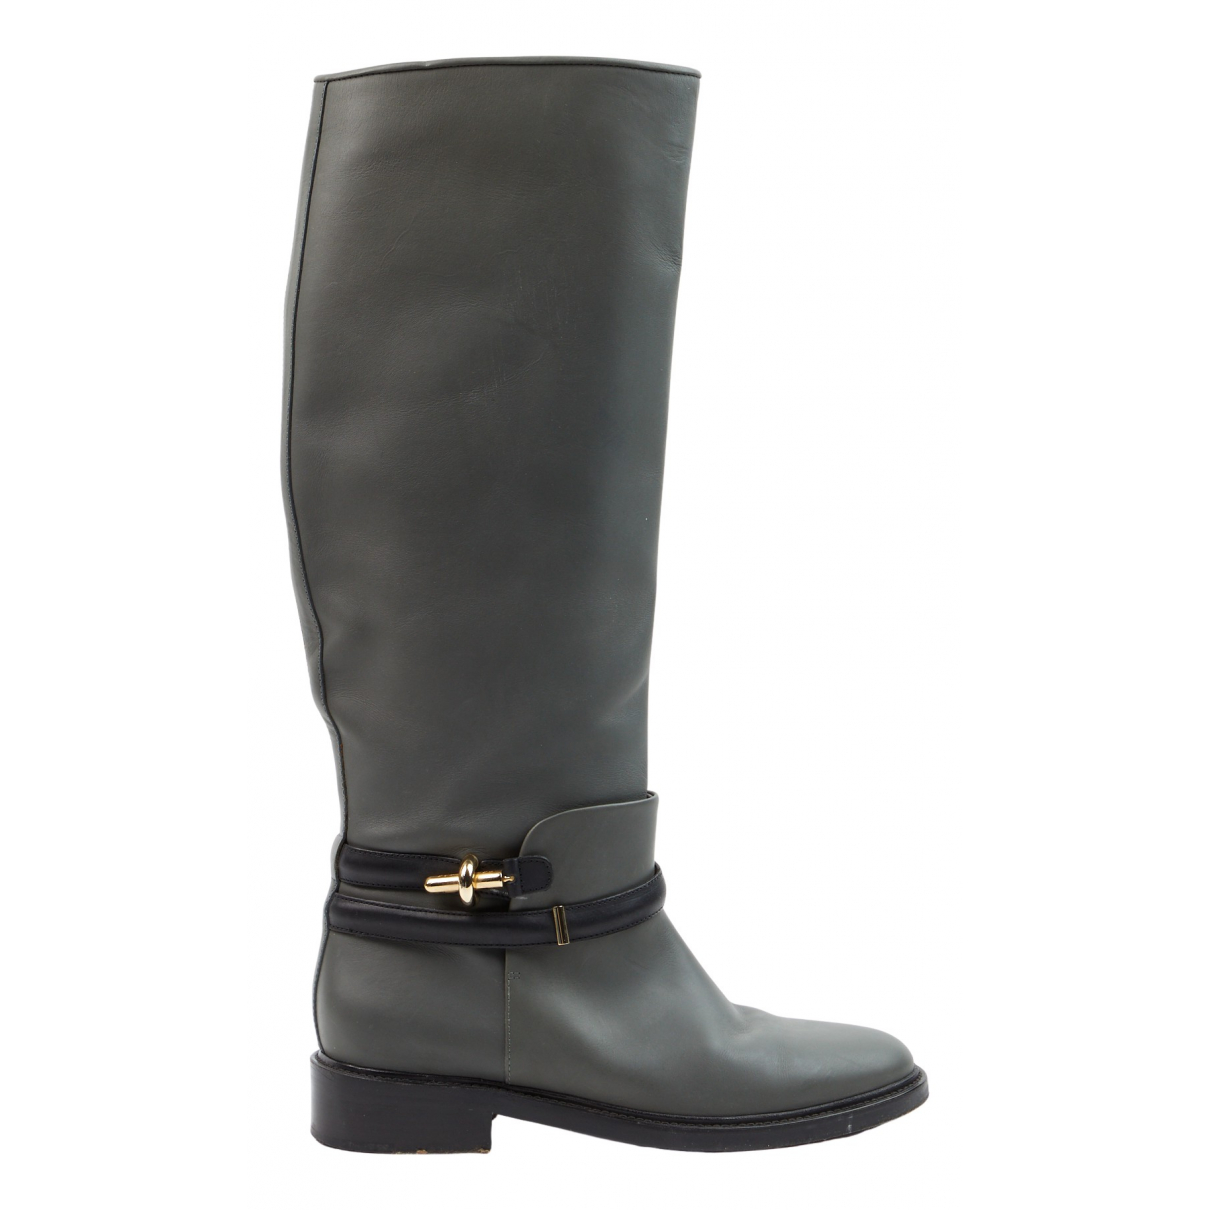 Balenciaga N Grey Leather Boots for Women 39 EU